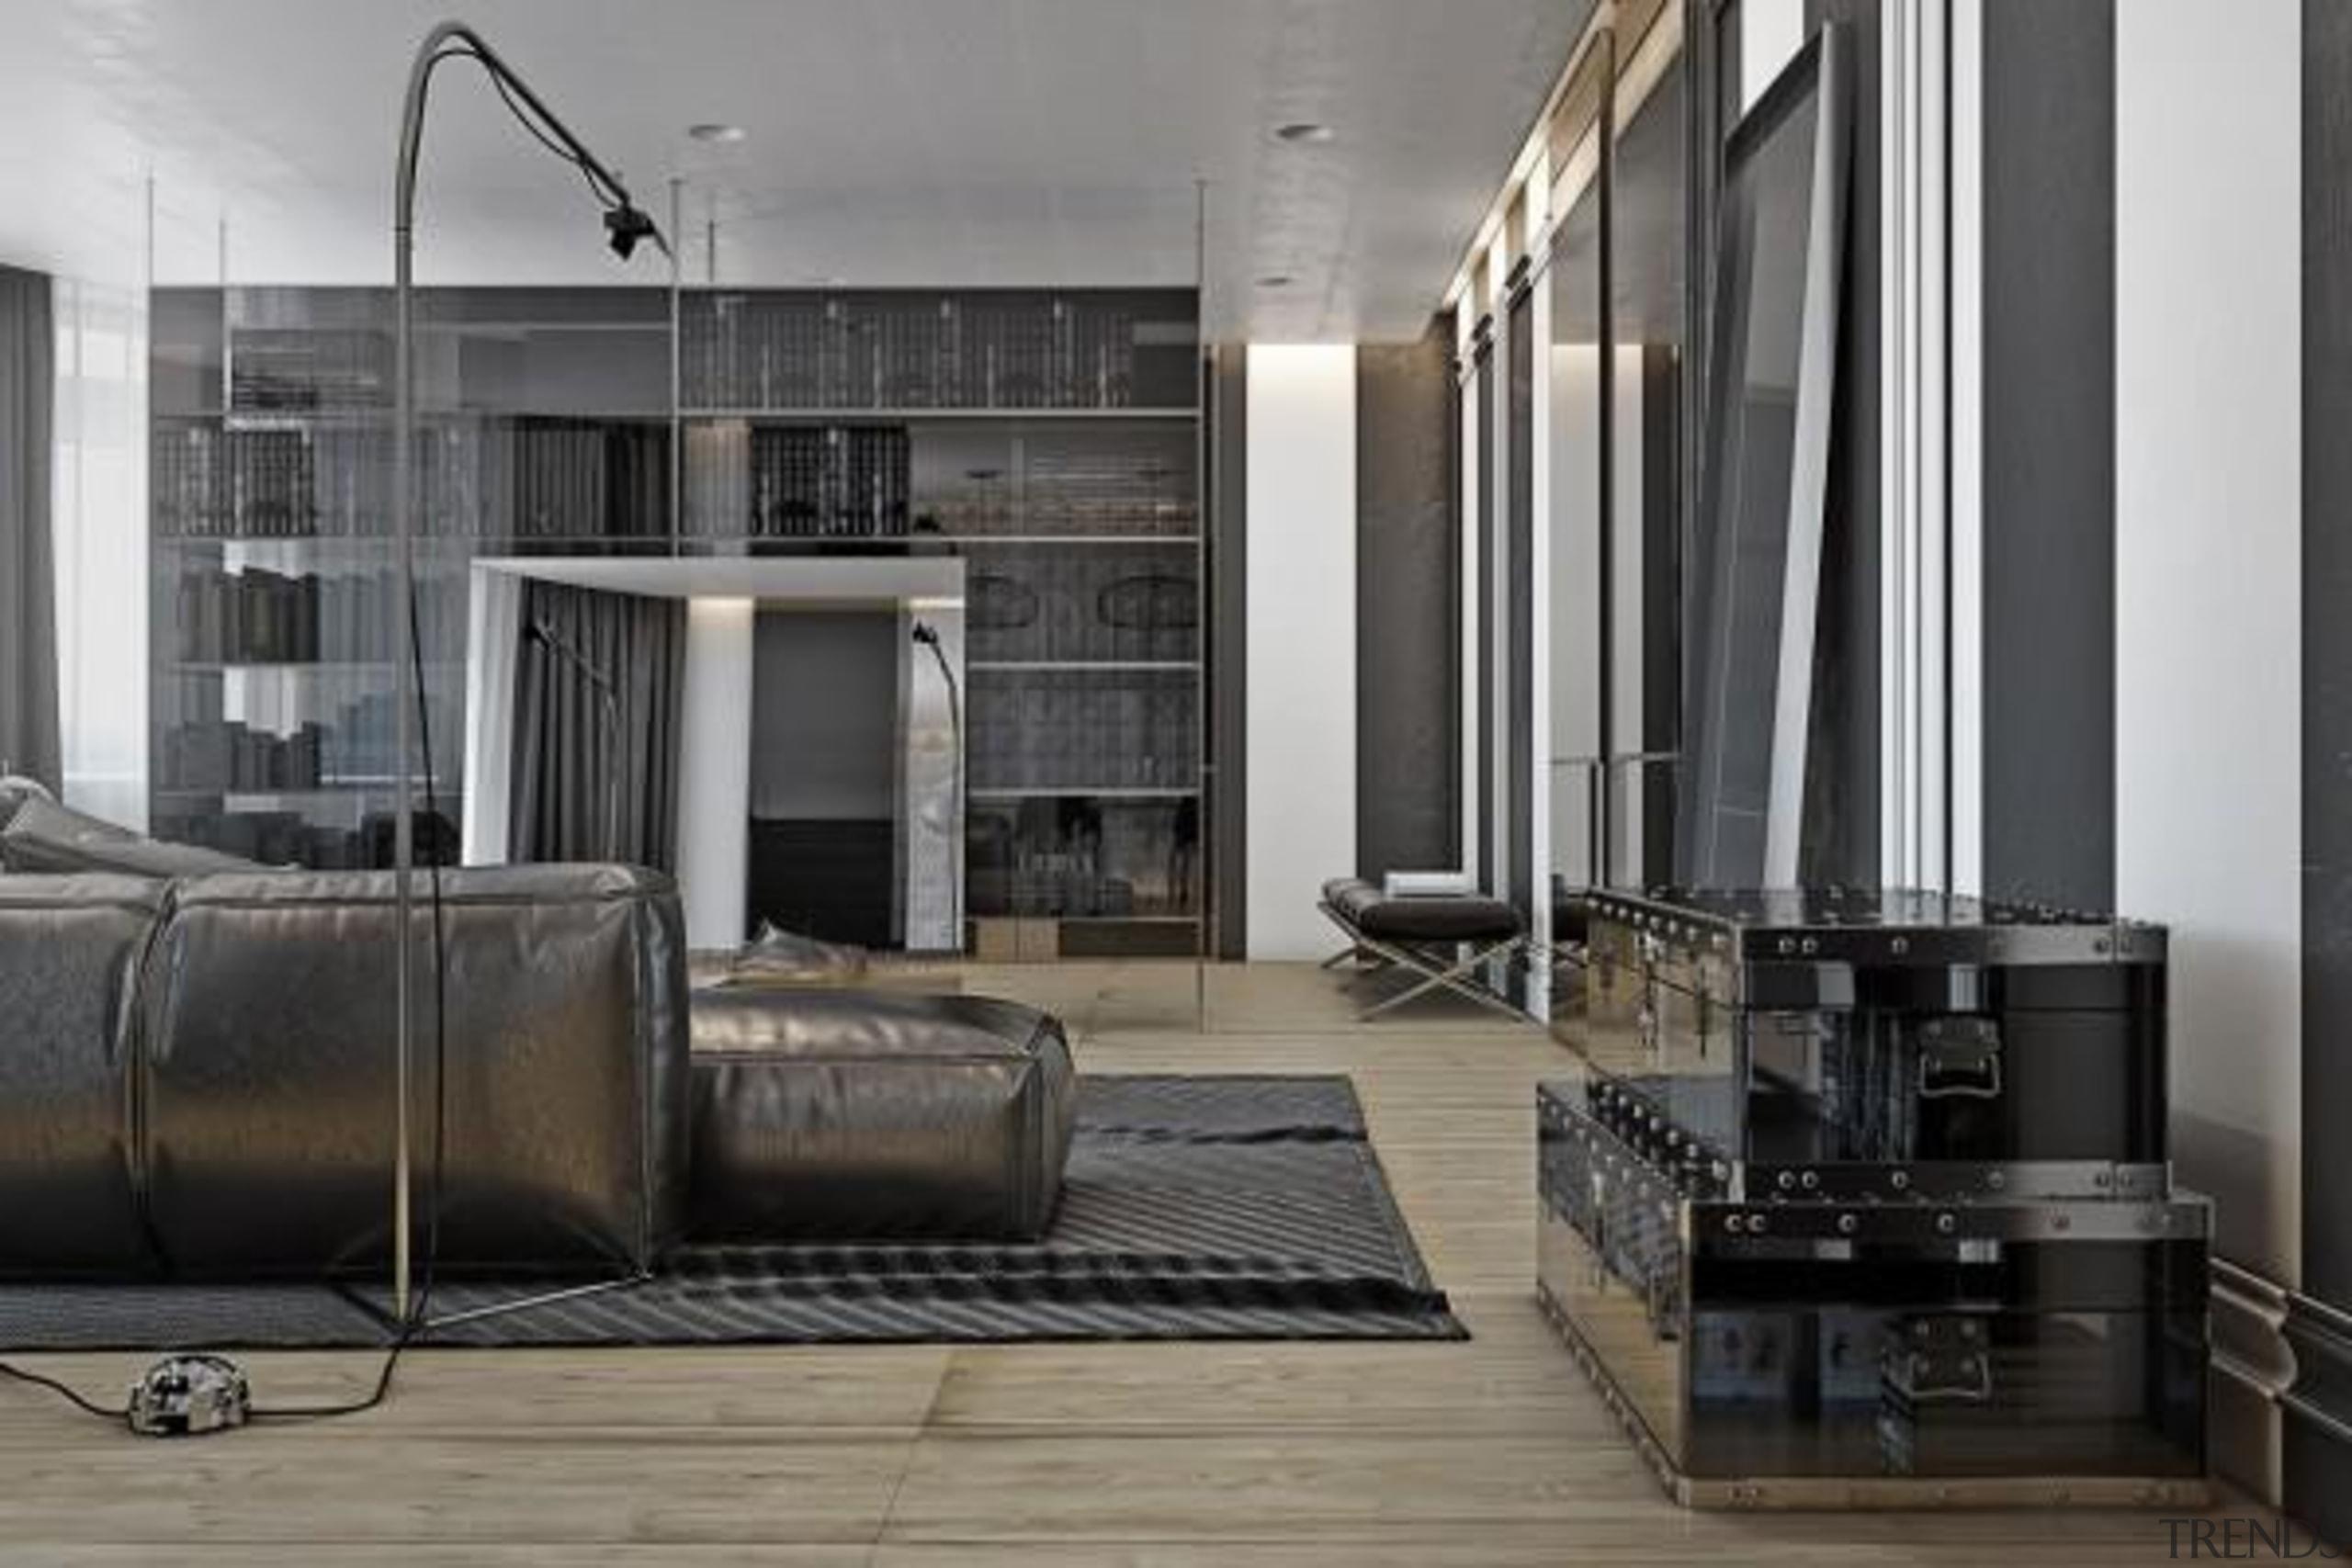 creative clear storage - Masculine Apartments - floor floor, flooring, furniture, interior design, living room, lobby, gray, black